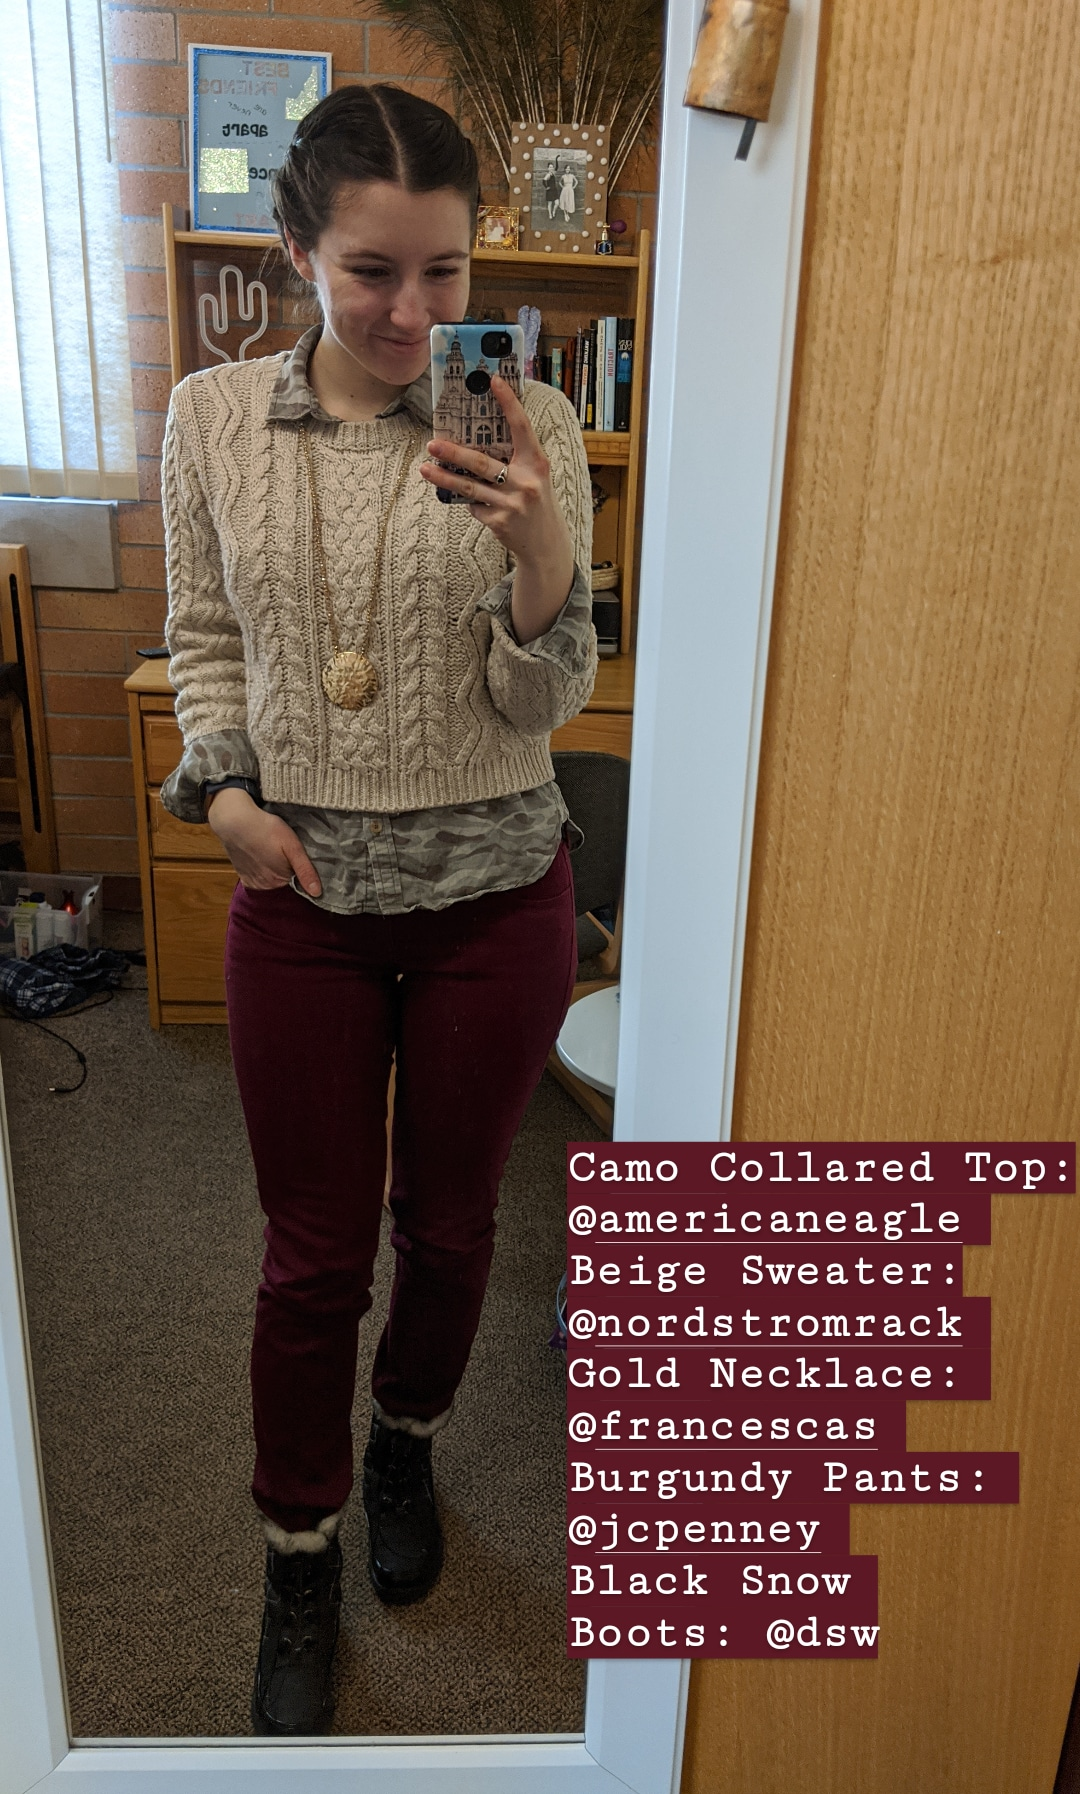 beige sweater, preppy, camo collared shirt